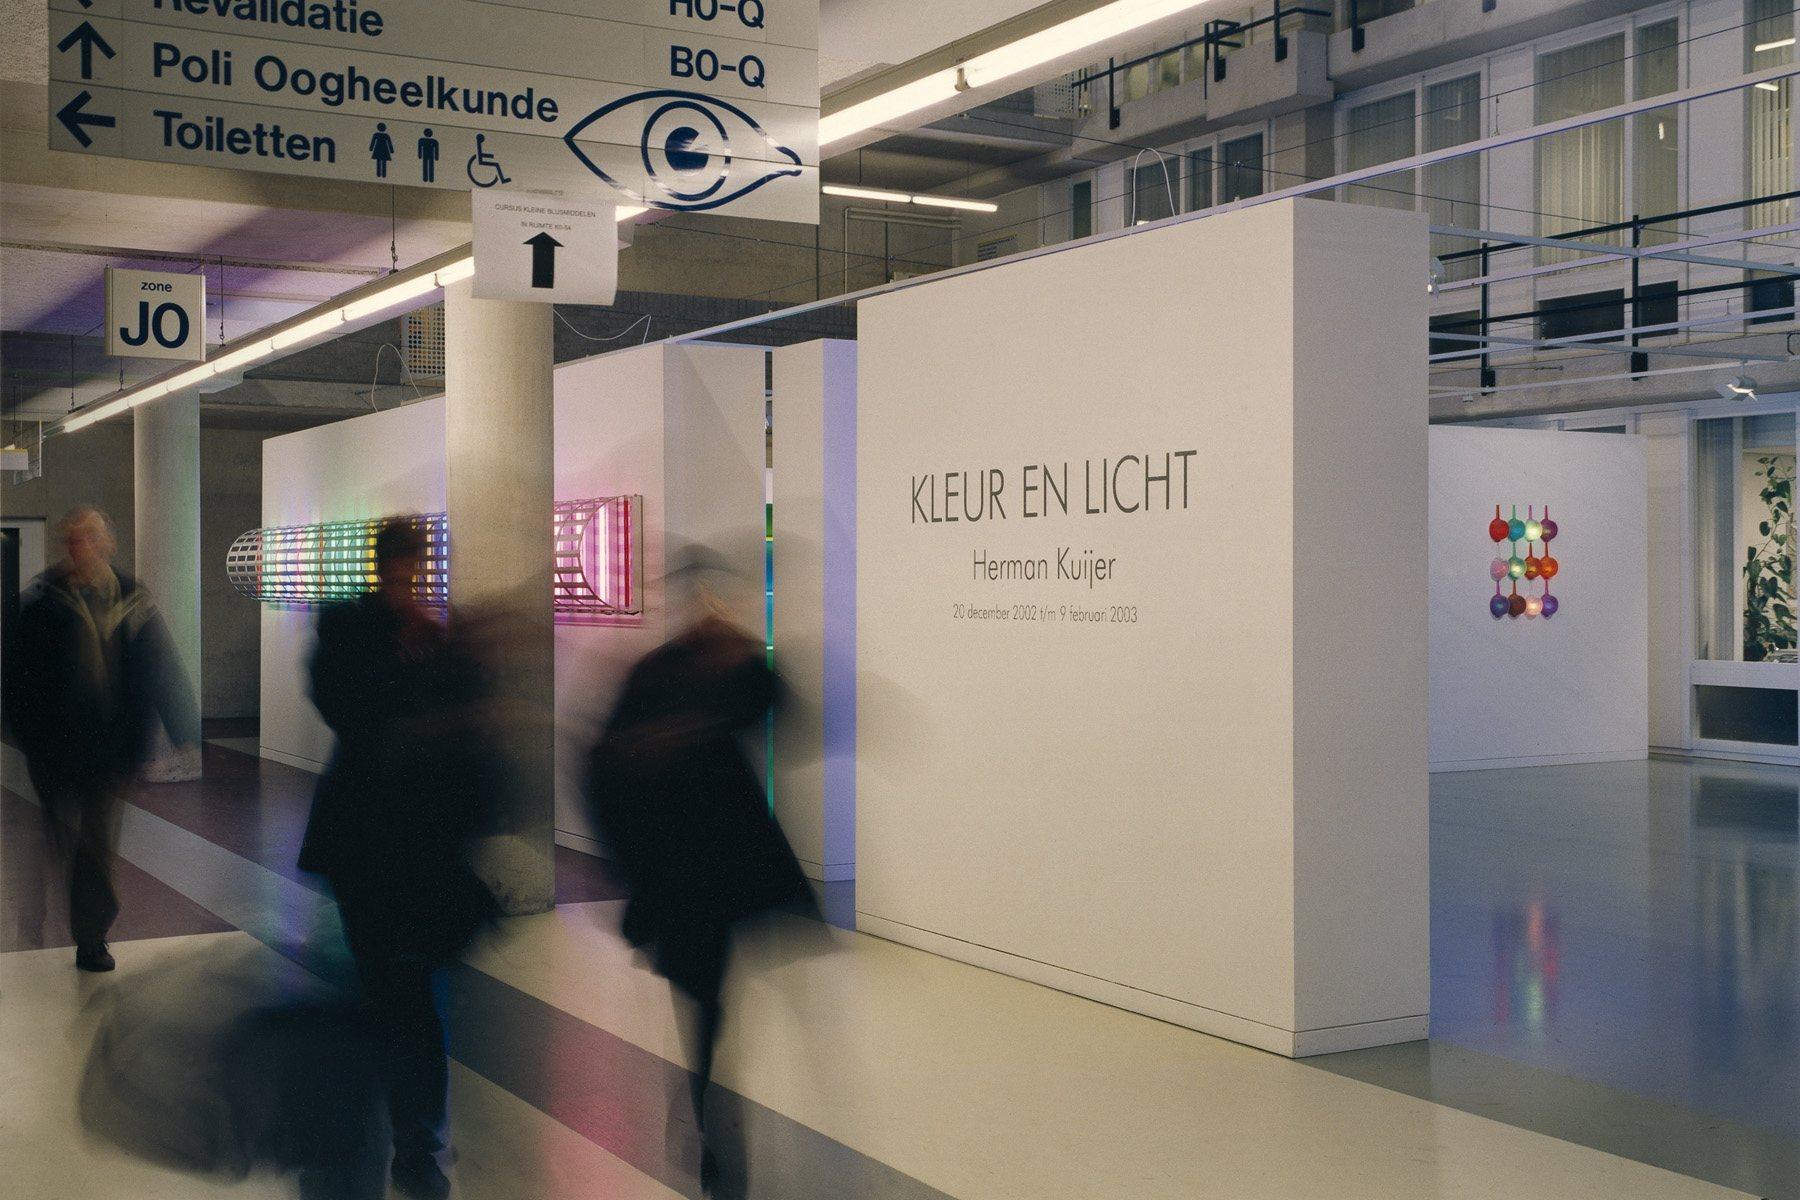 Lichtkunst - Leiden Kunststichting LUMC